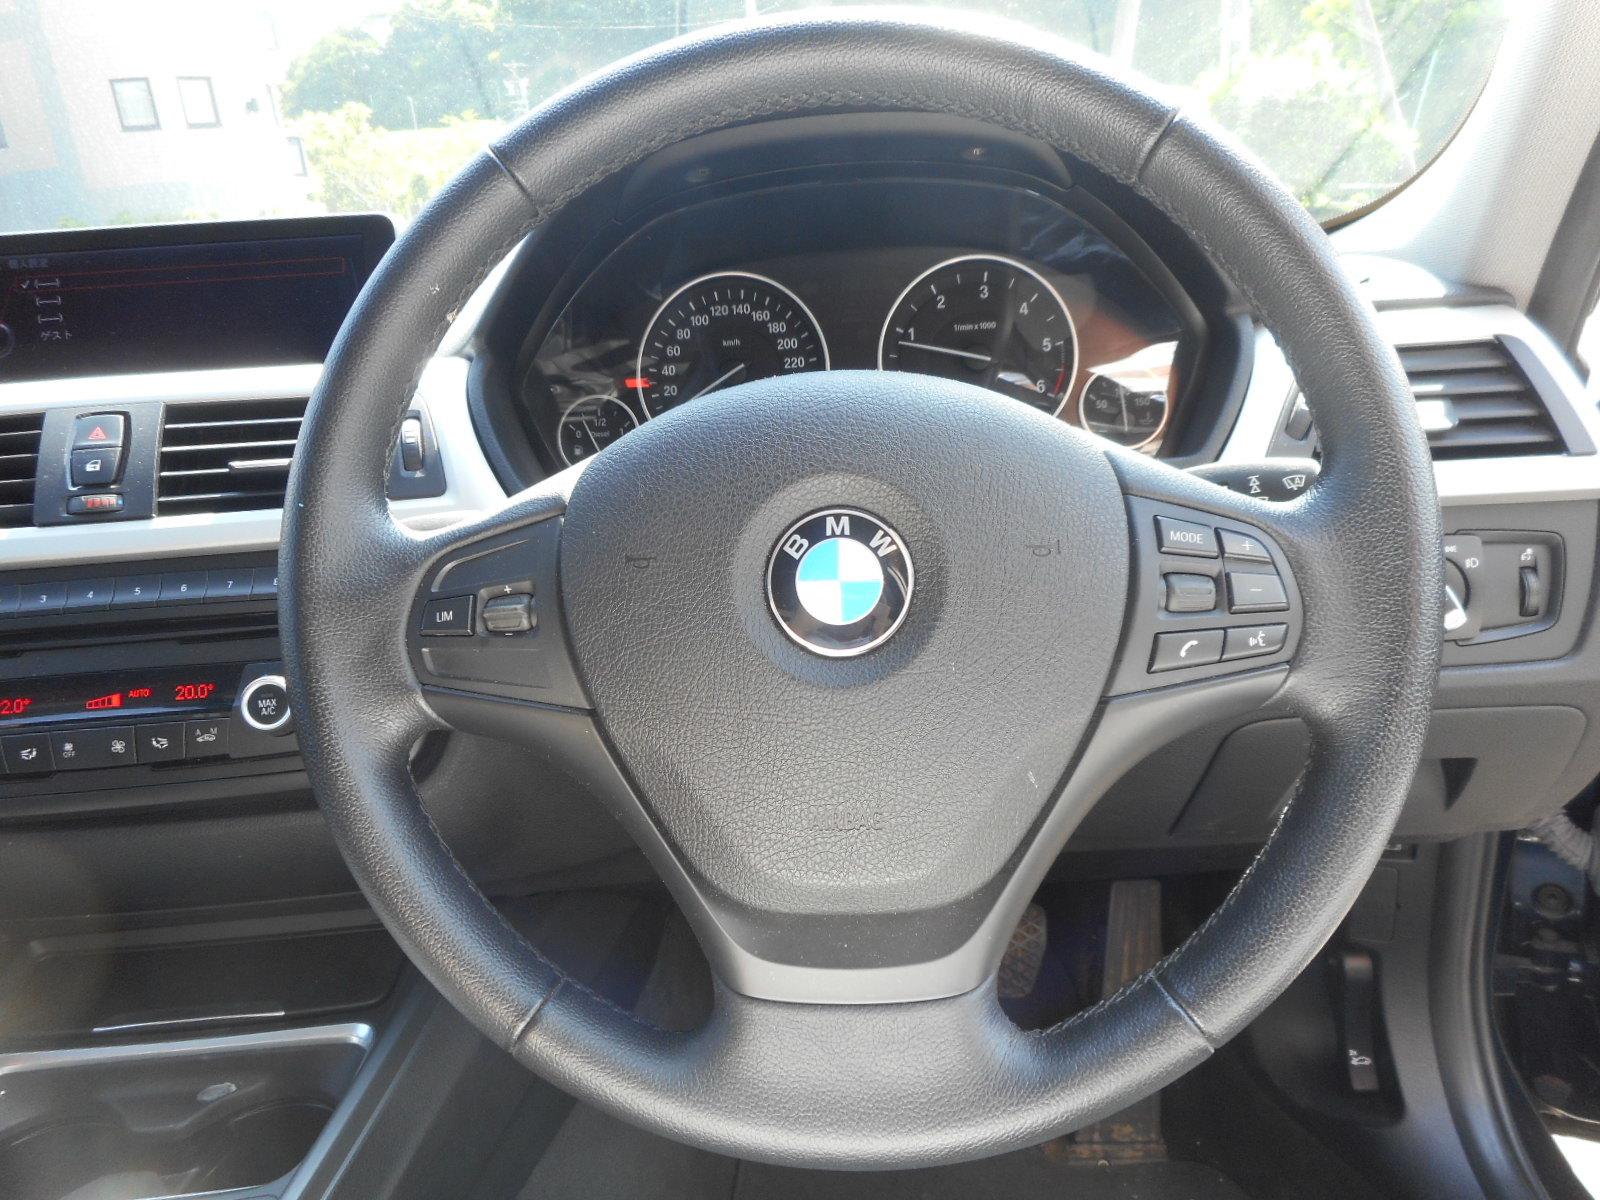 BMW 320d入りました!_c0267693_17522675.jpg